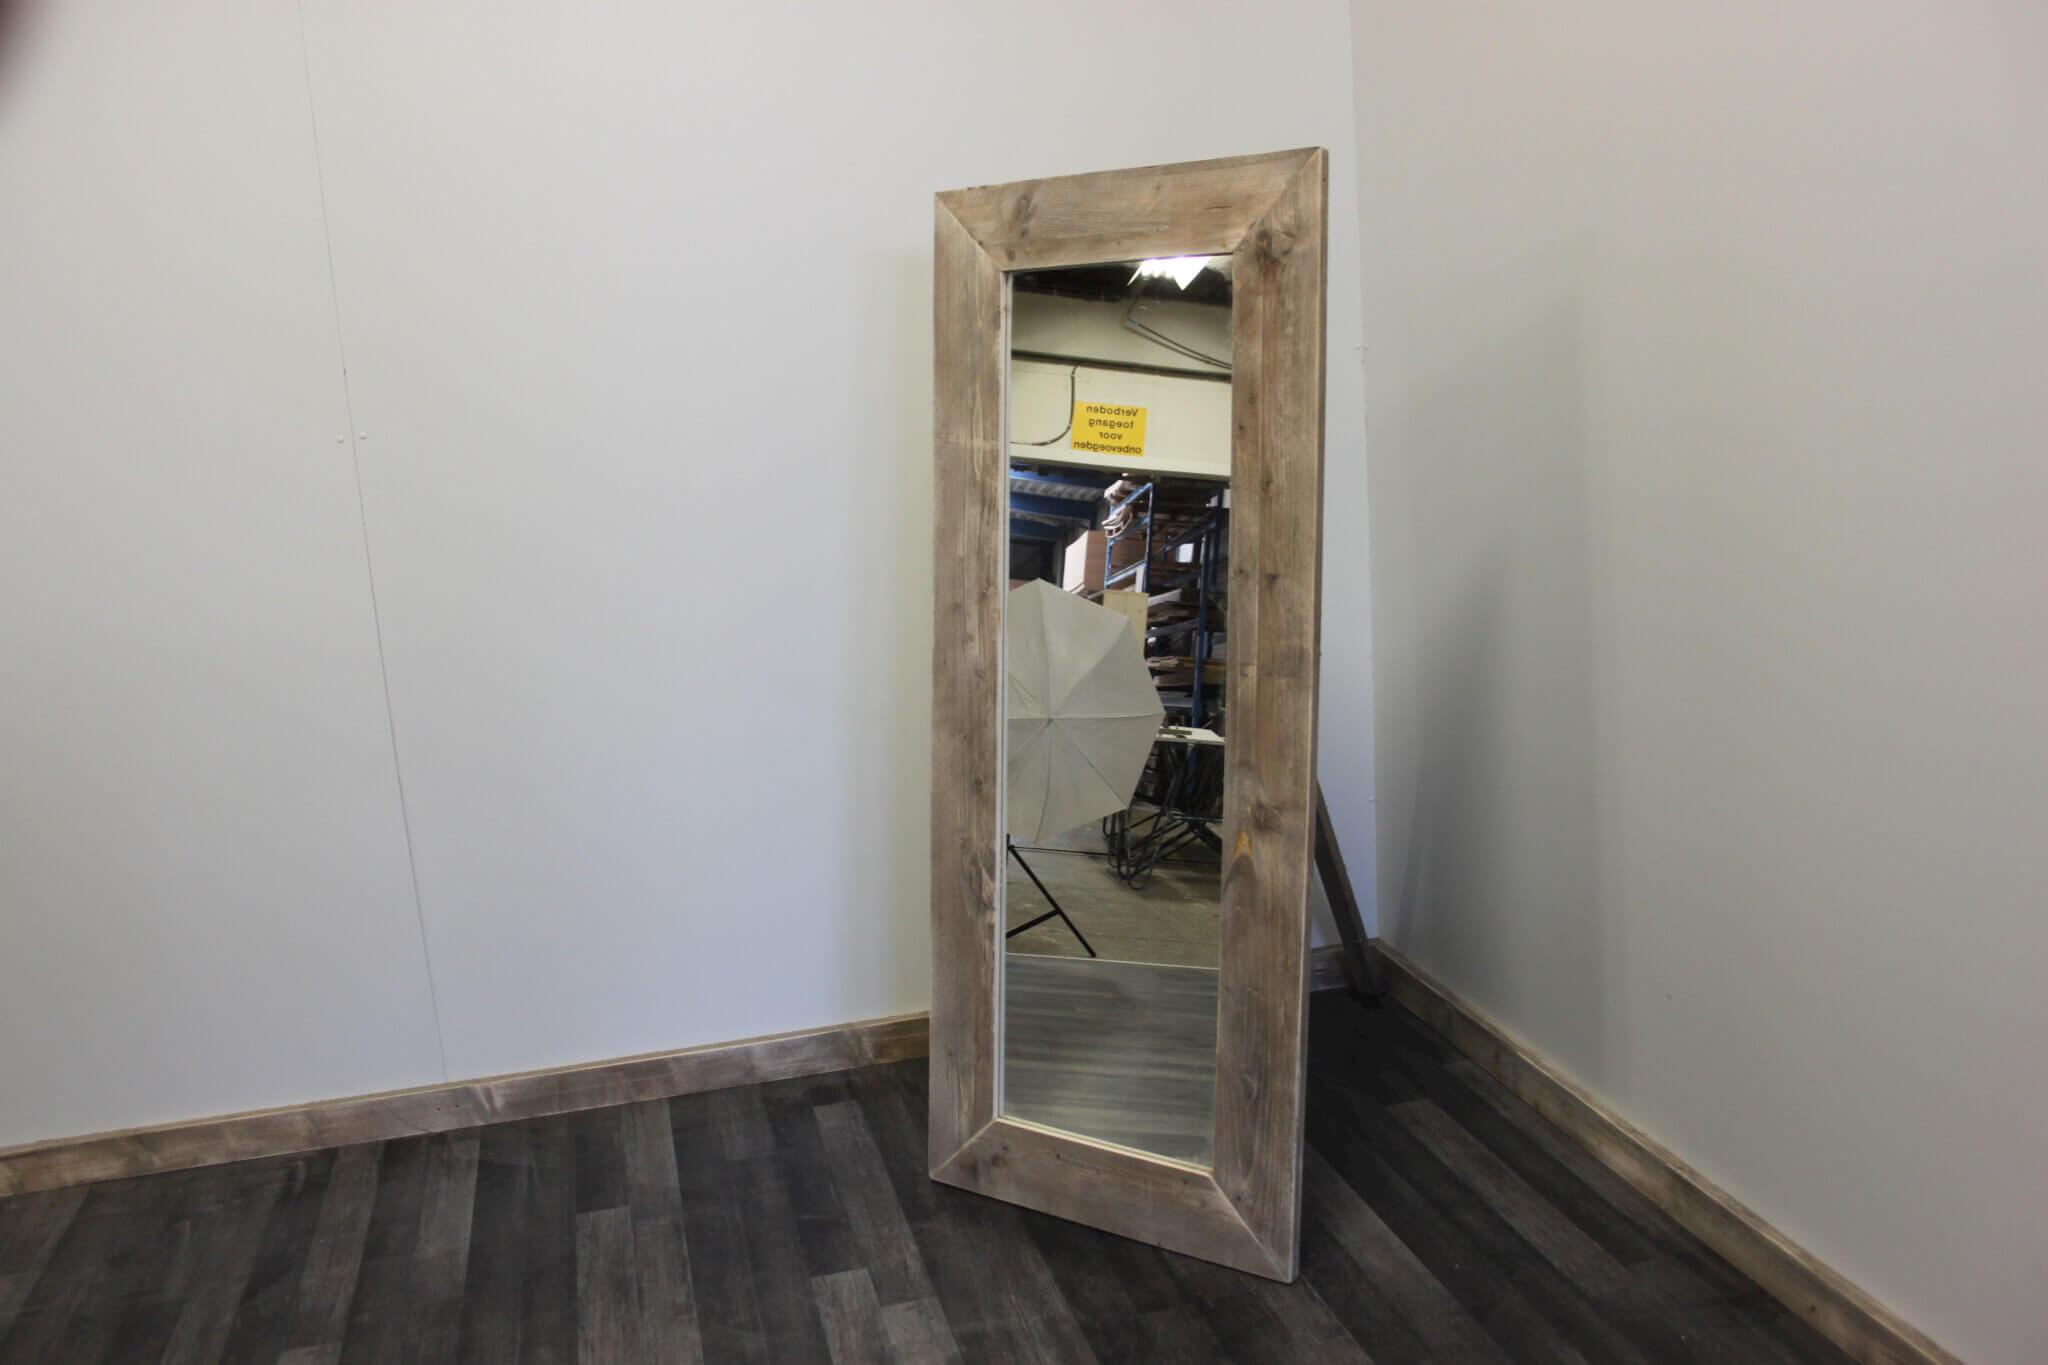 Slaapkamer Spiegel : Steigerhouten spiegel Melita – SteigerhoutTrend